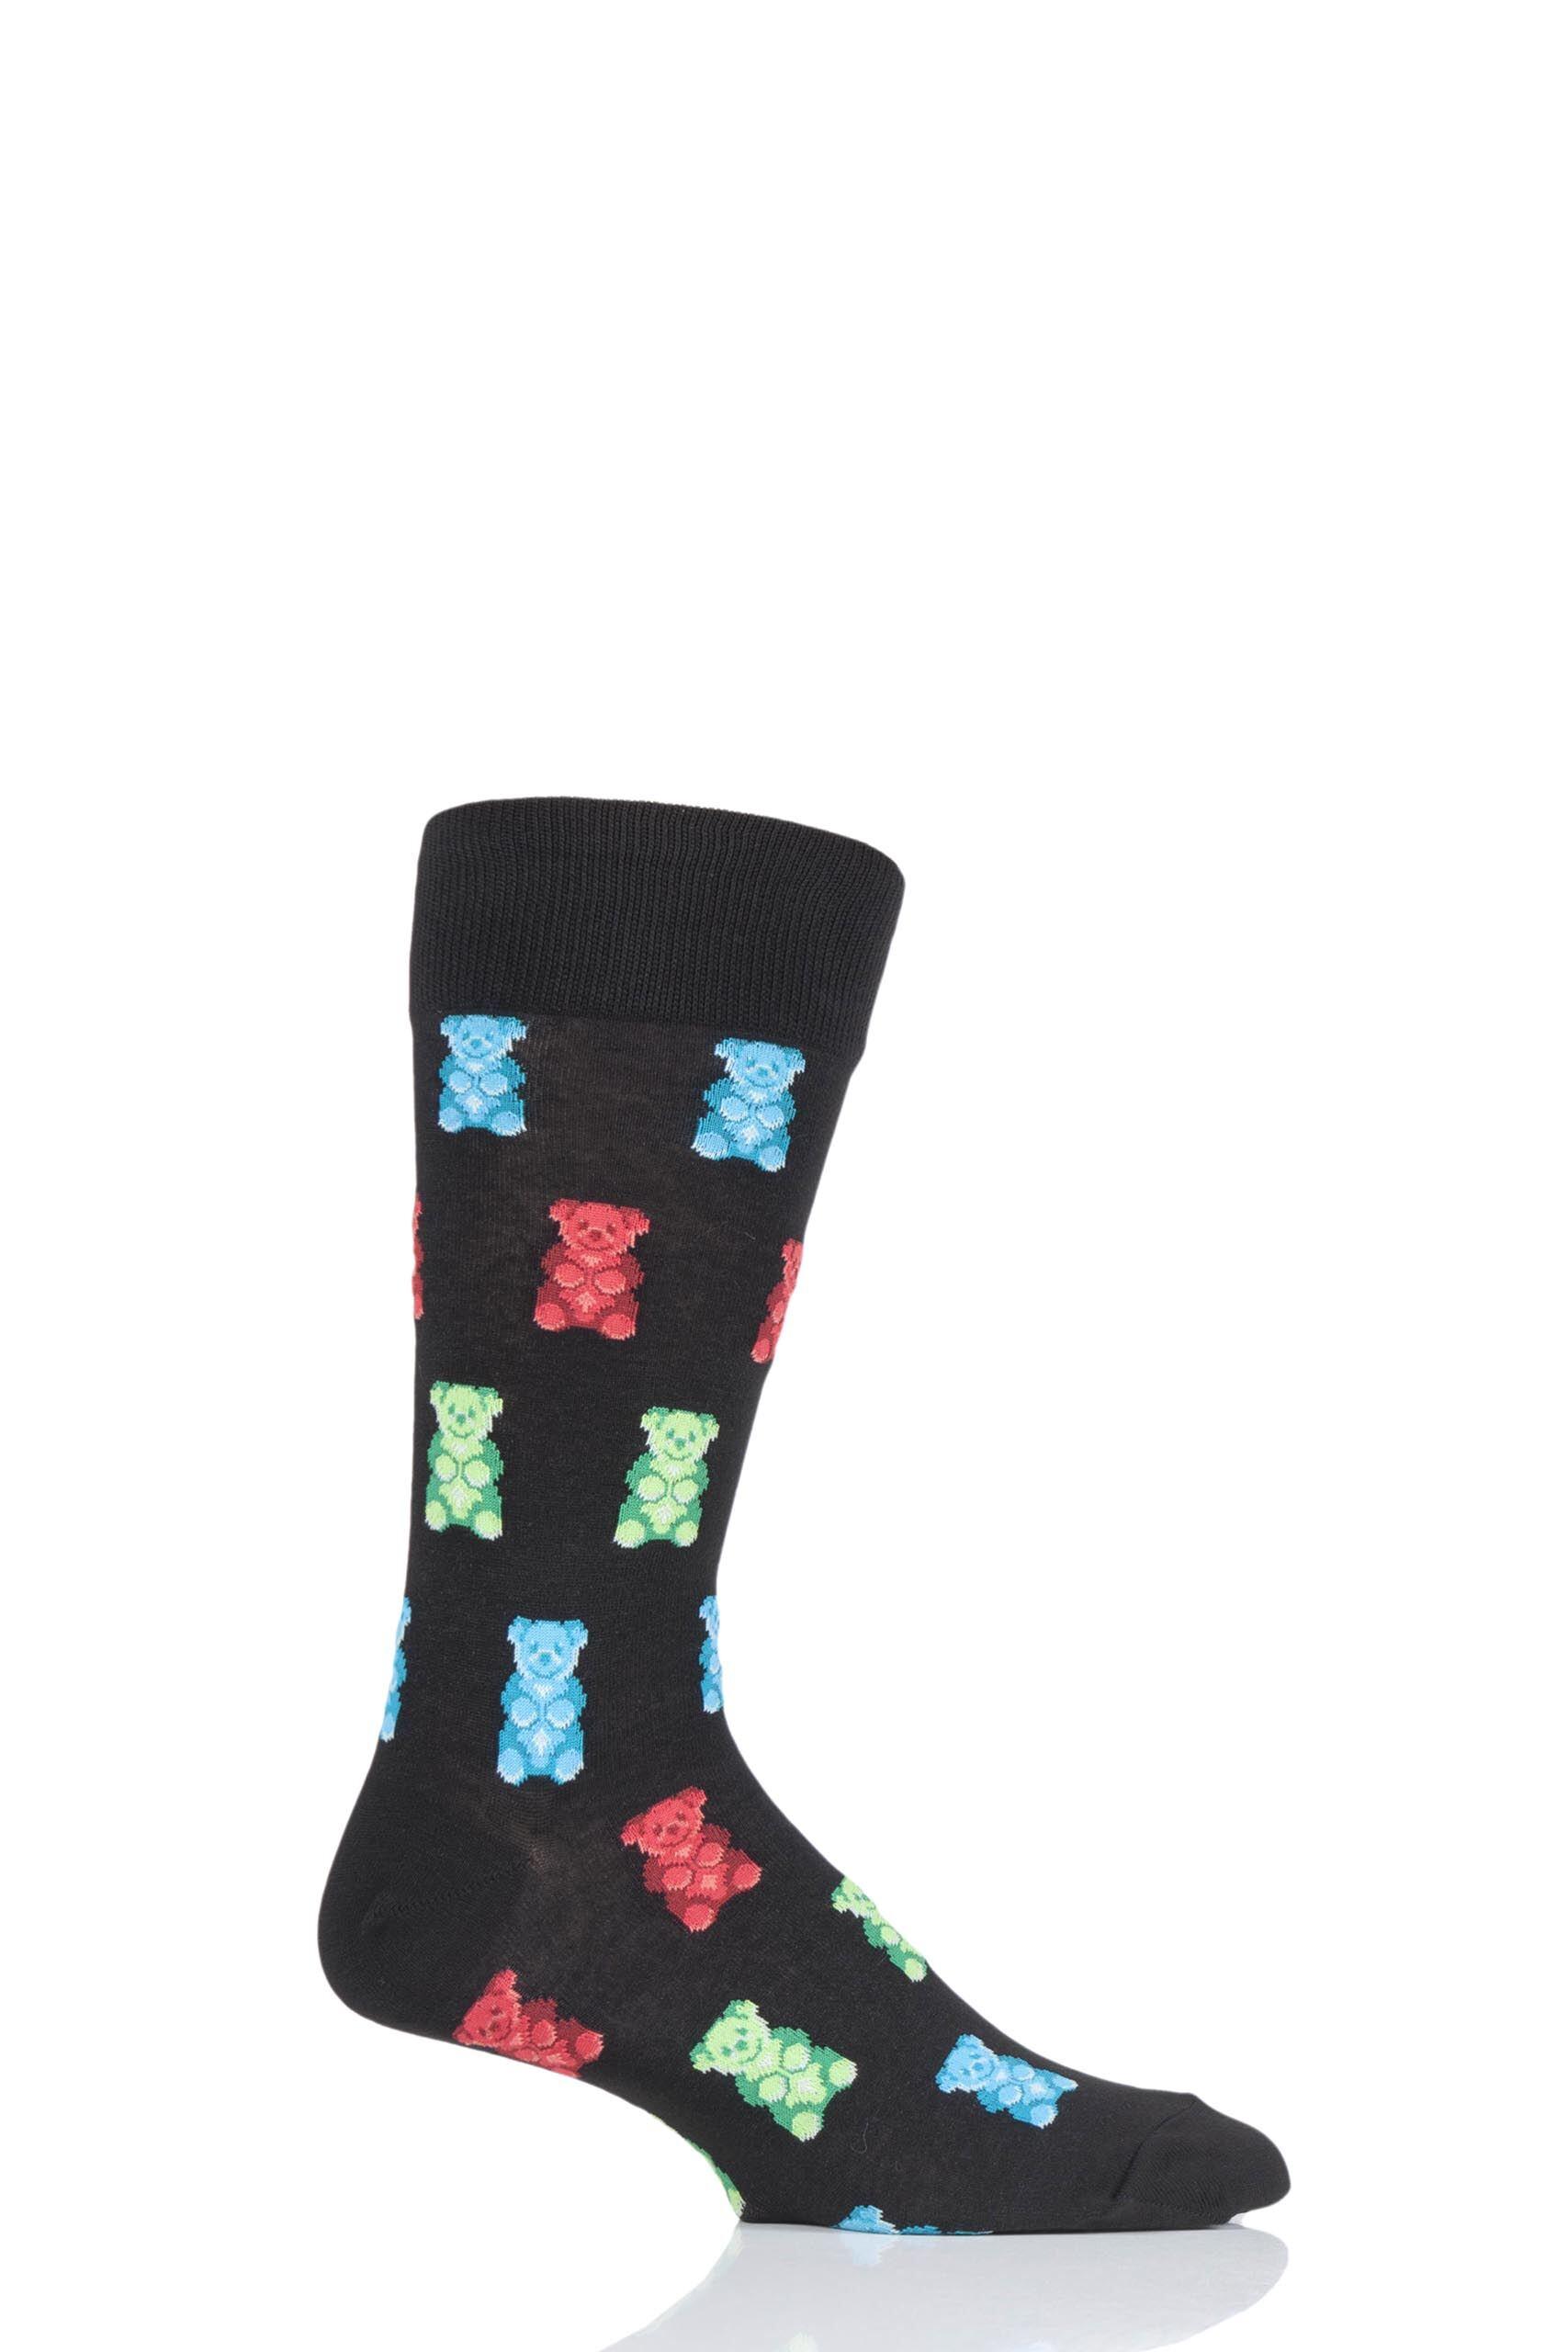 Image of 1 Pair Black HotSox All Over Gummy Bears Cotton Socks Men's 8-12 Mens - Hot Sox